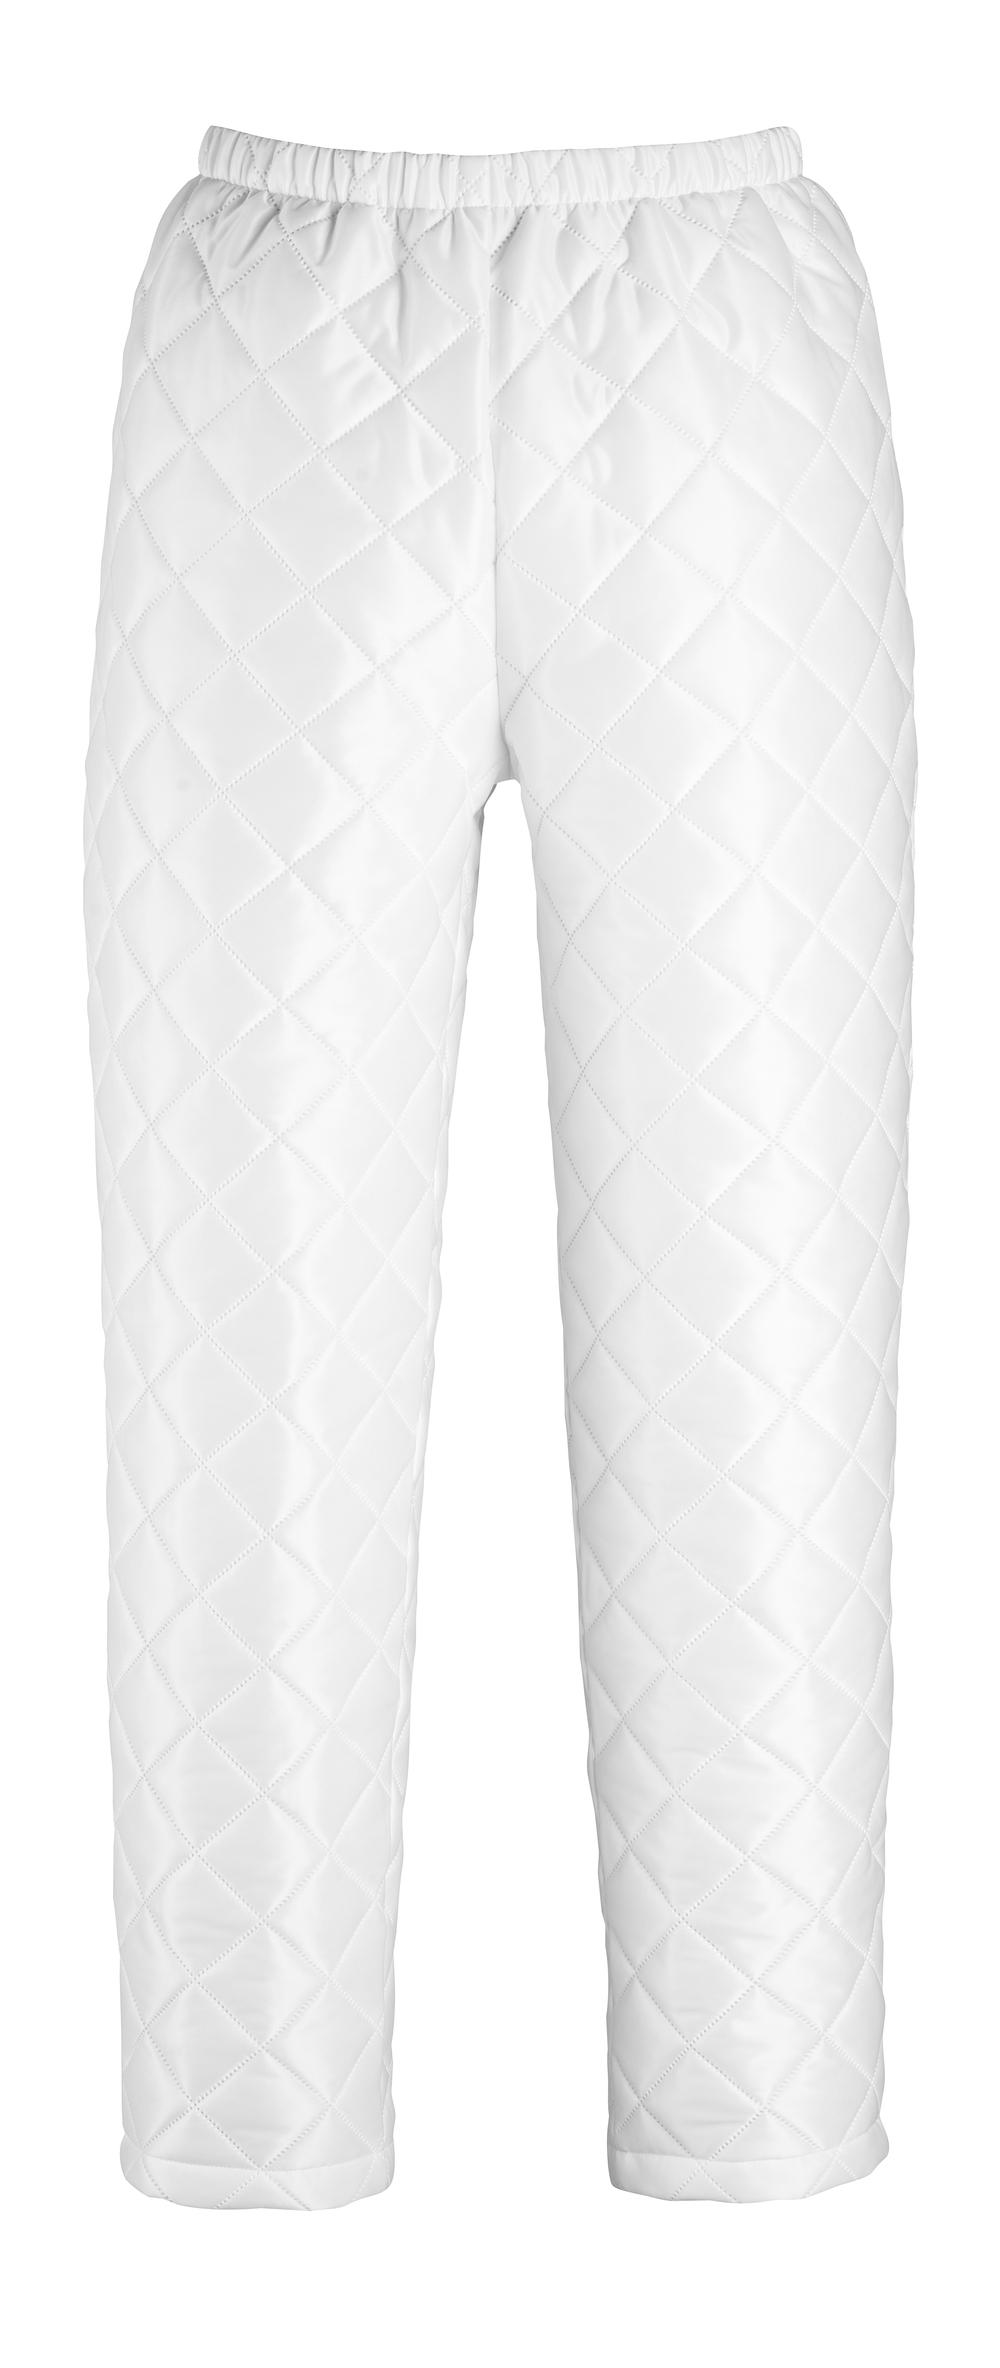 13578-707-06 Pantaloni Termici - bianco